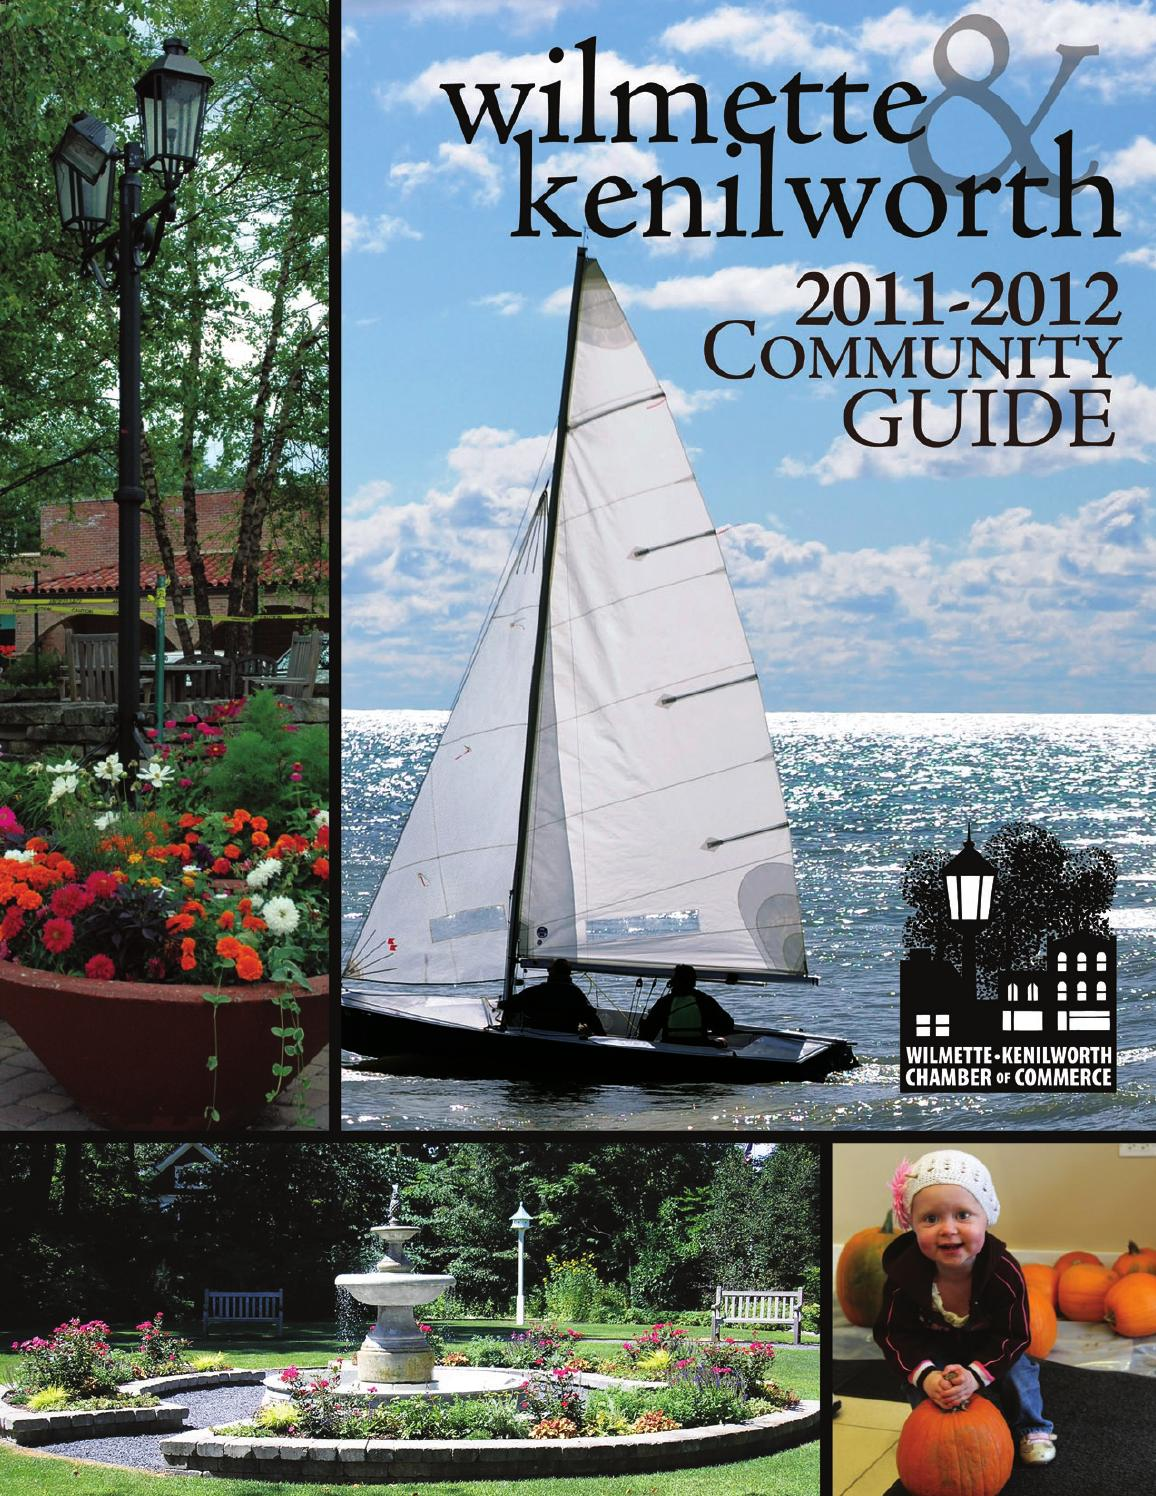 Wilmette 2011 Community Guide by jDubbs Creative - issuu